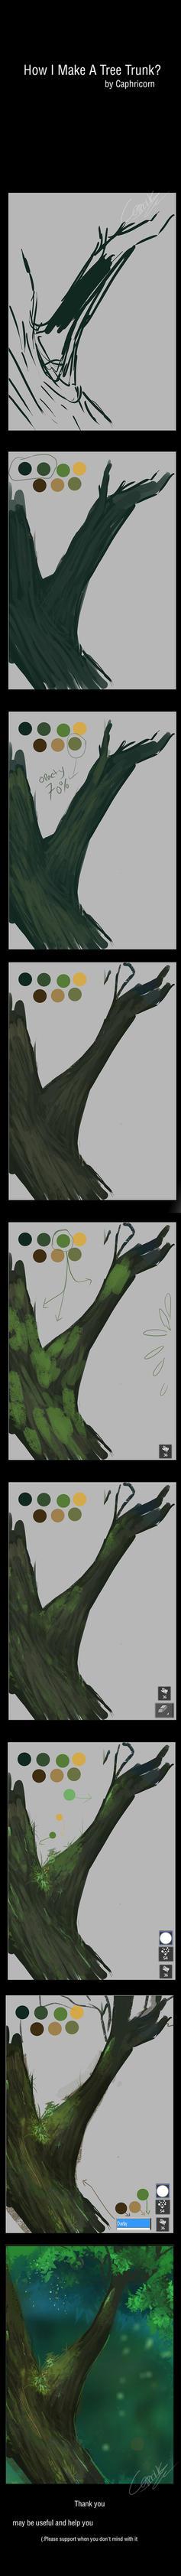 How i Make a Tree Trunks by Closz